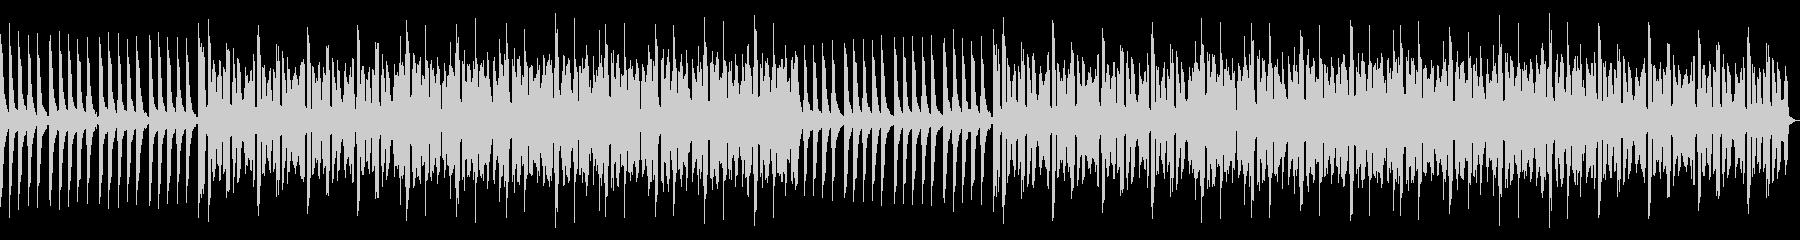 Digital. graphic. Techno_4's unreproduced waveform